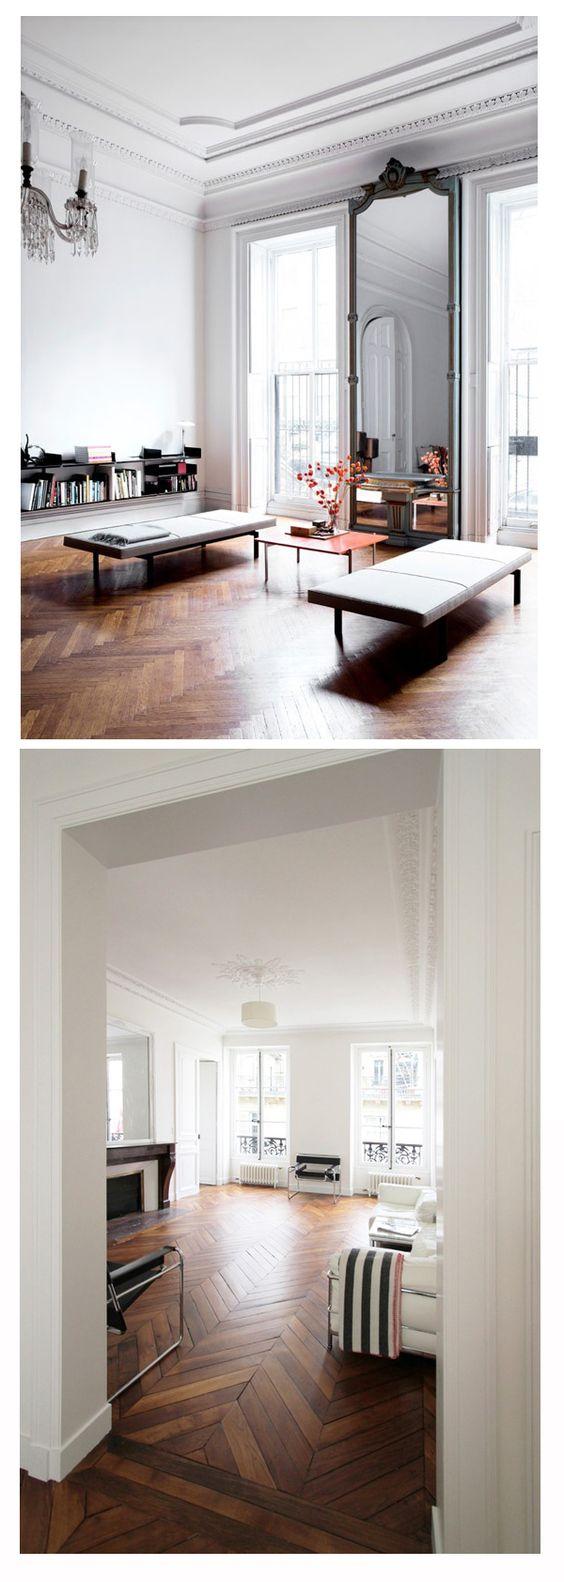 Delicious Twist: Parquet floors